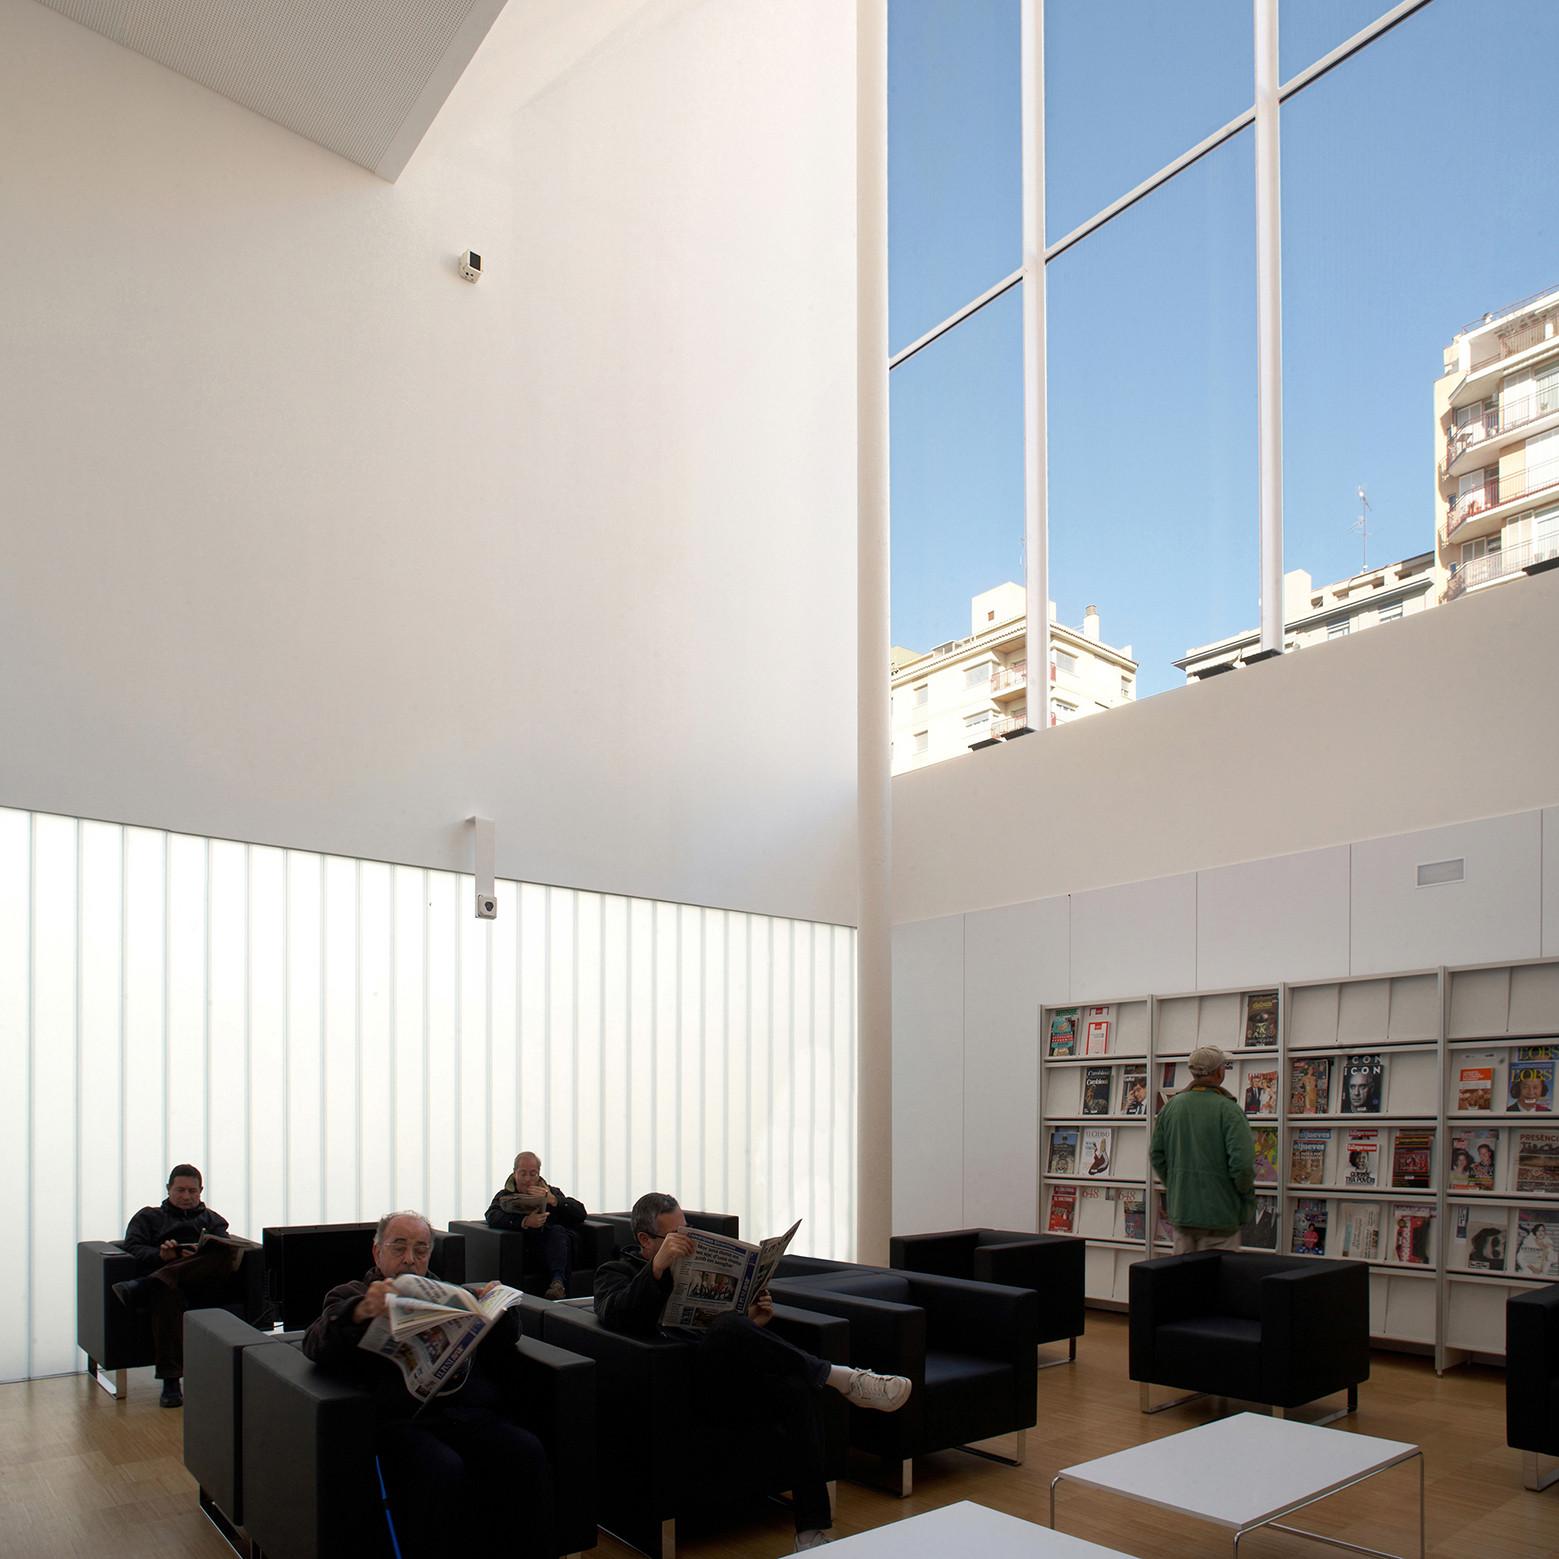 Biblioteca p blica de girona corea moran arquitectura archdaily brasil - Arquitectura girona ...